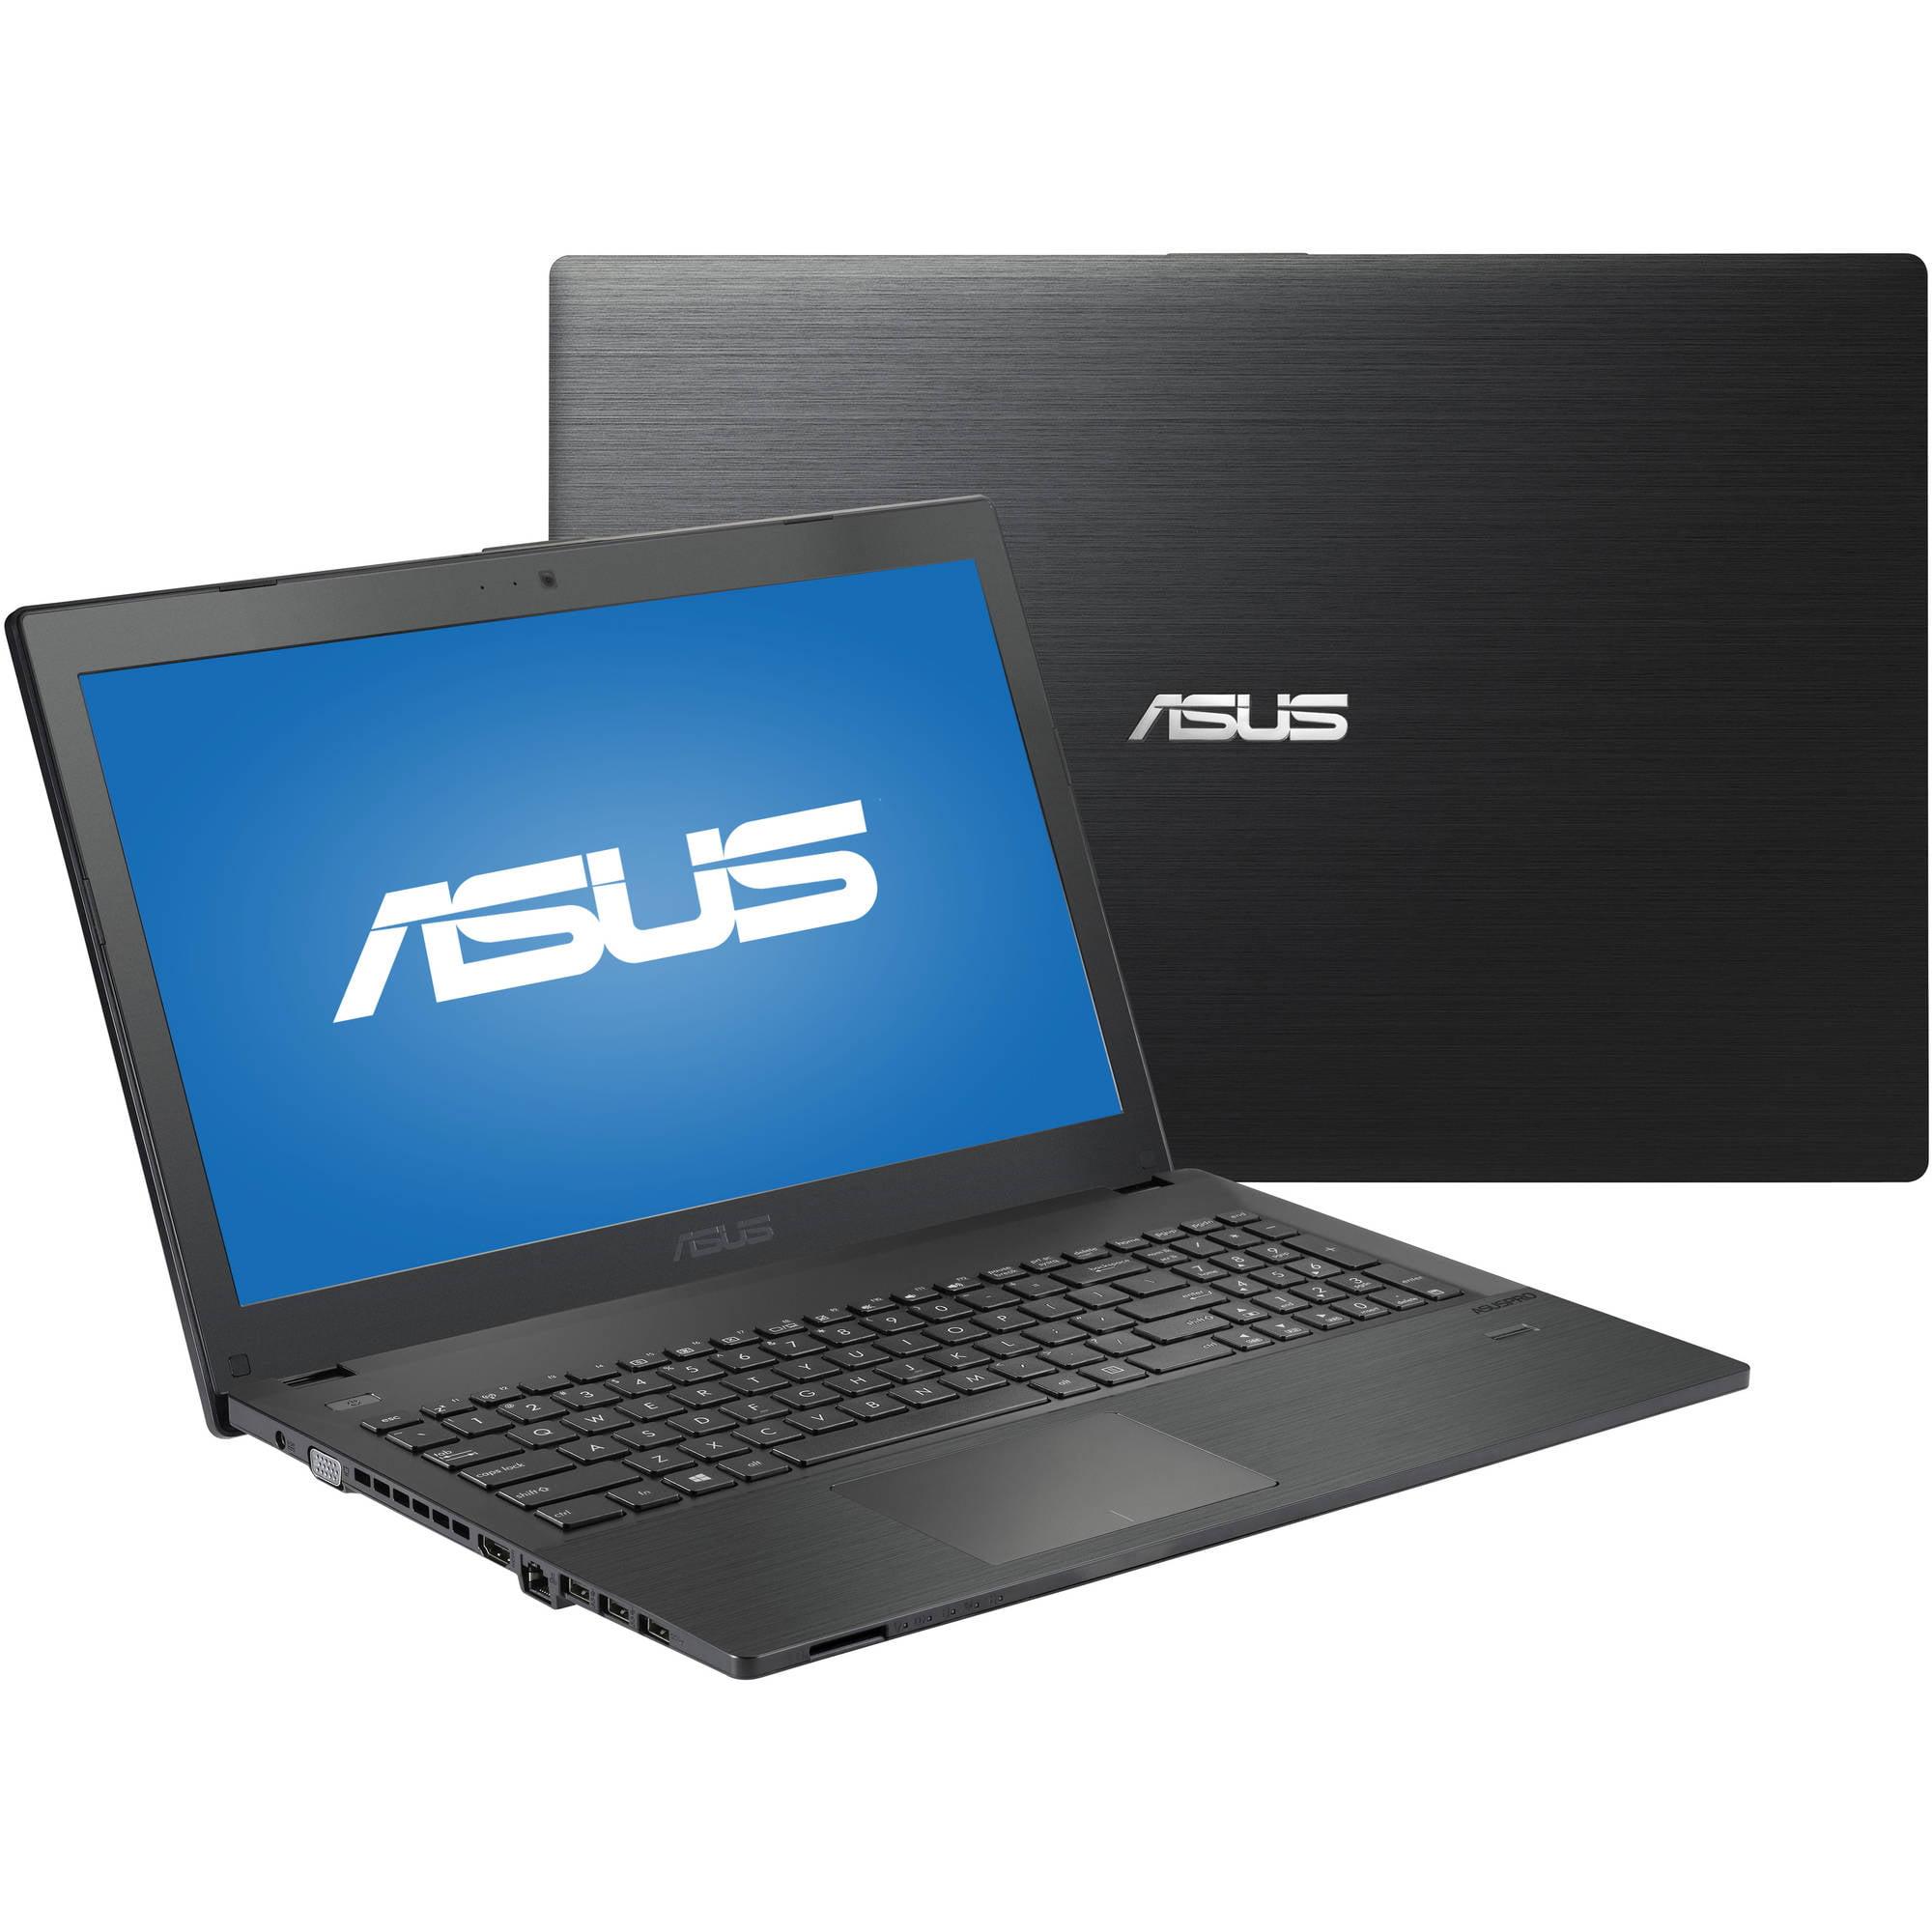 "Asus P2520LAXH31 15.6"" Laptop, Windows 7 Professional, In..."